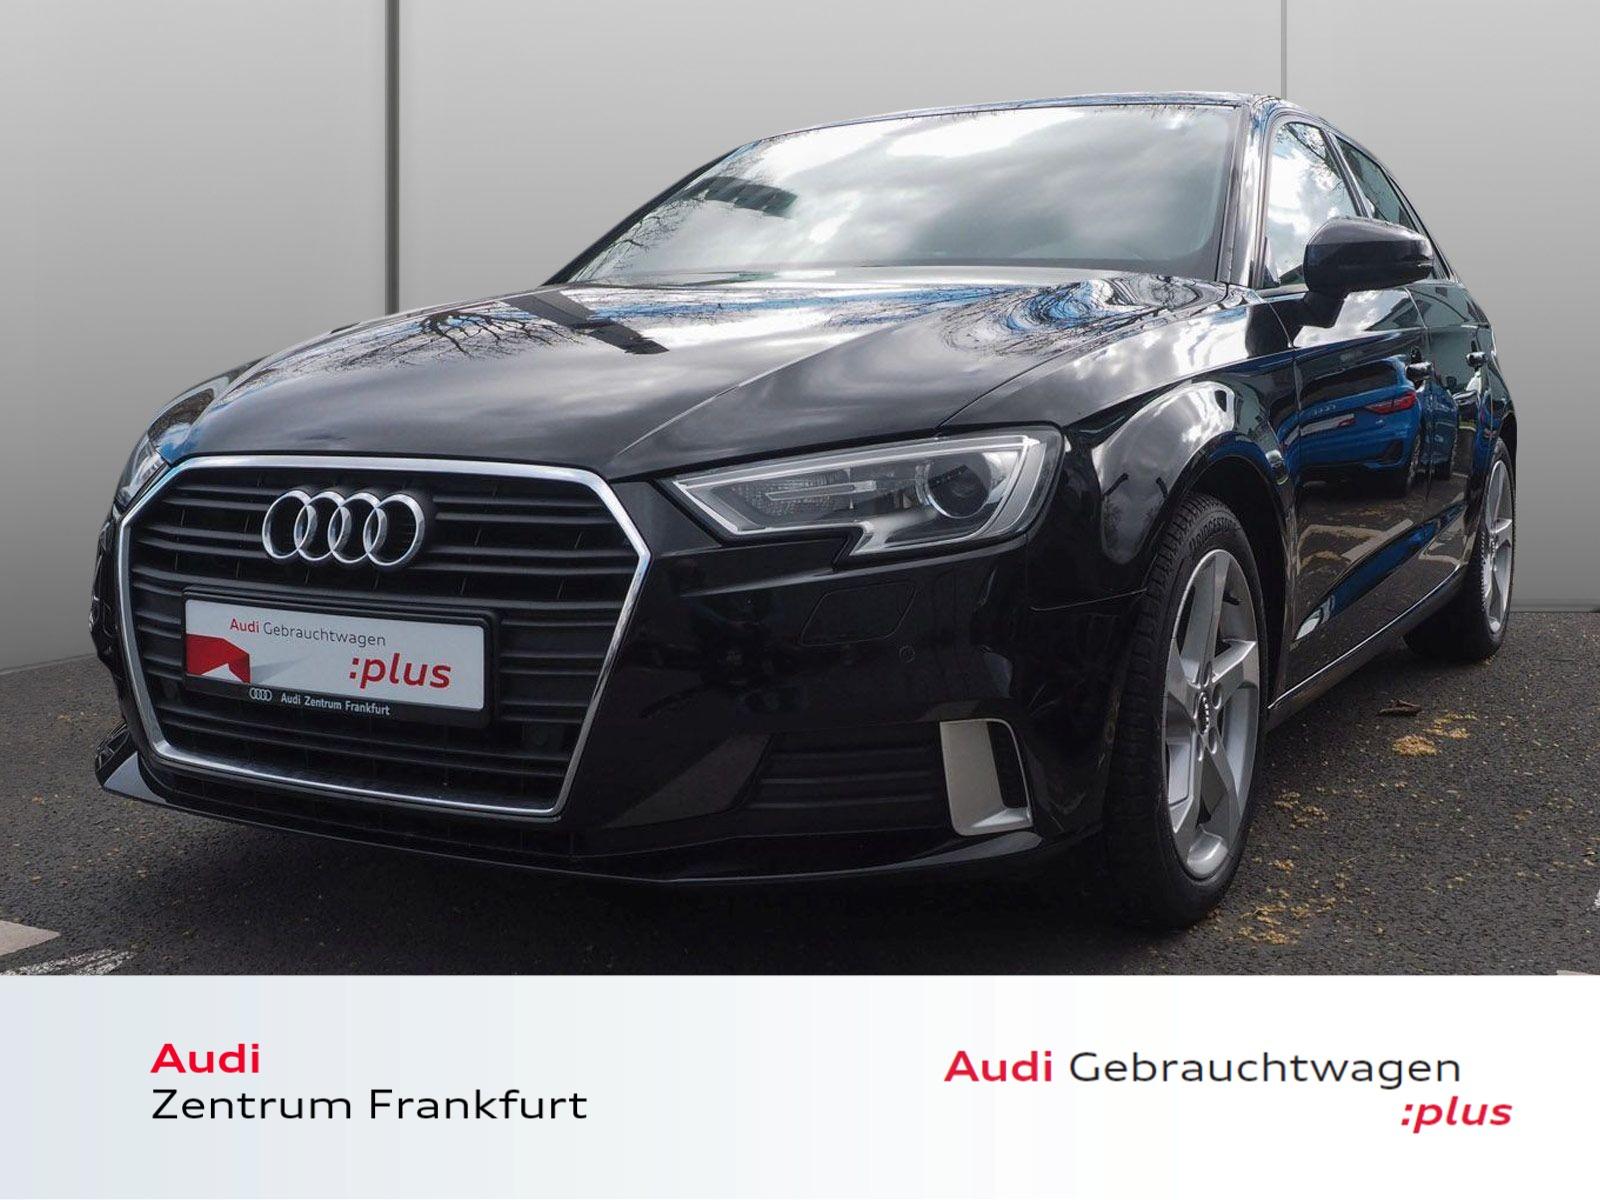 Audi A3 Sportback 30 TFSI sport S tronic Navi Xenon PDC Sitzheizung, Jahr 2019, Benzin